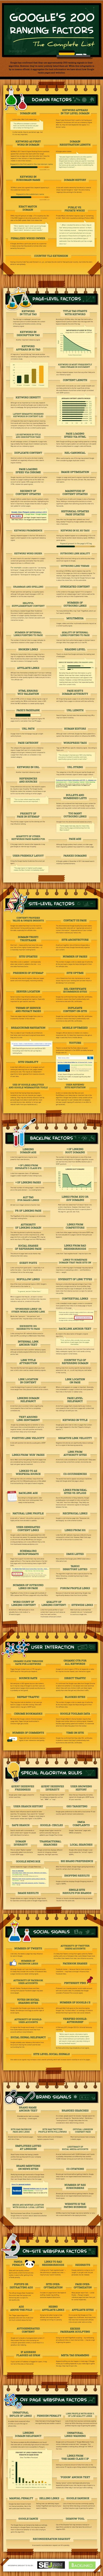 Google Ranking Factors Infographic